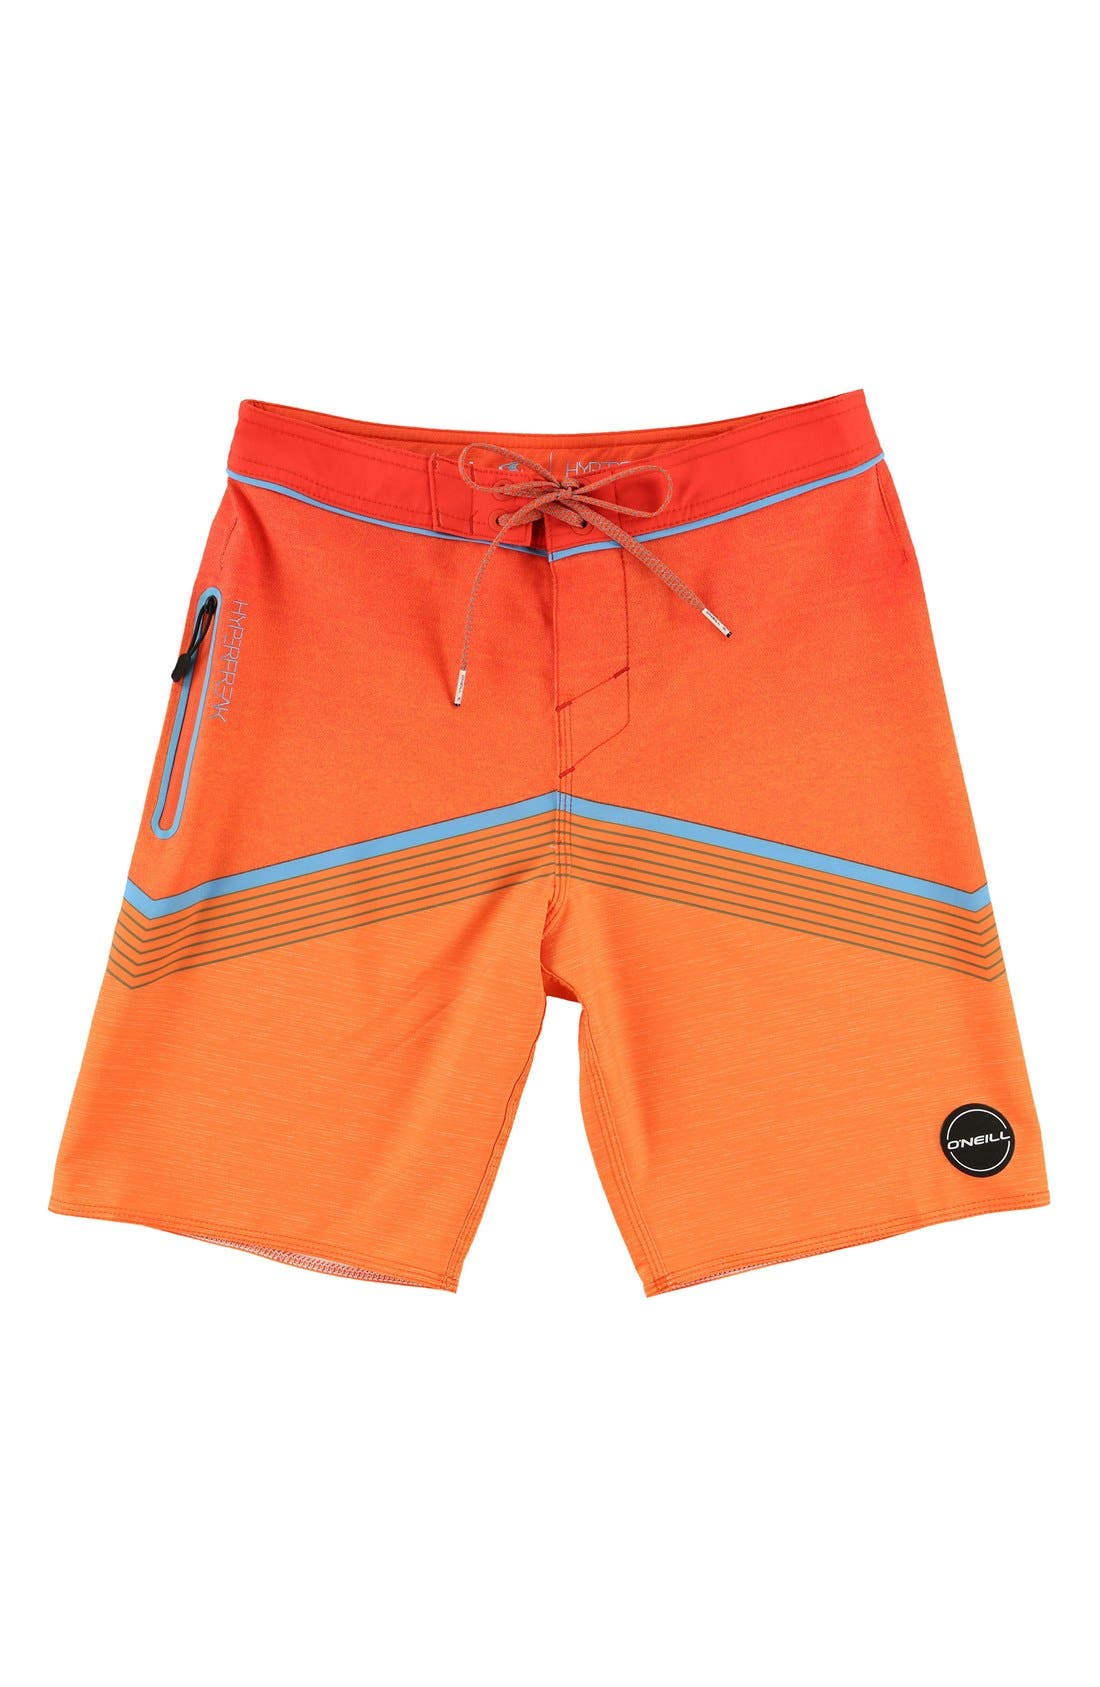 Hyperfreak Stretch Board Shorts,                             Main thumbnail 2, color,